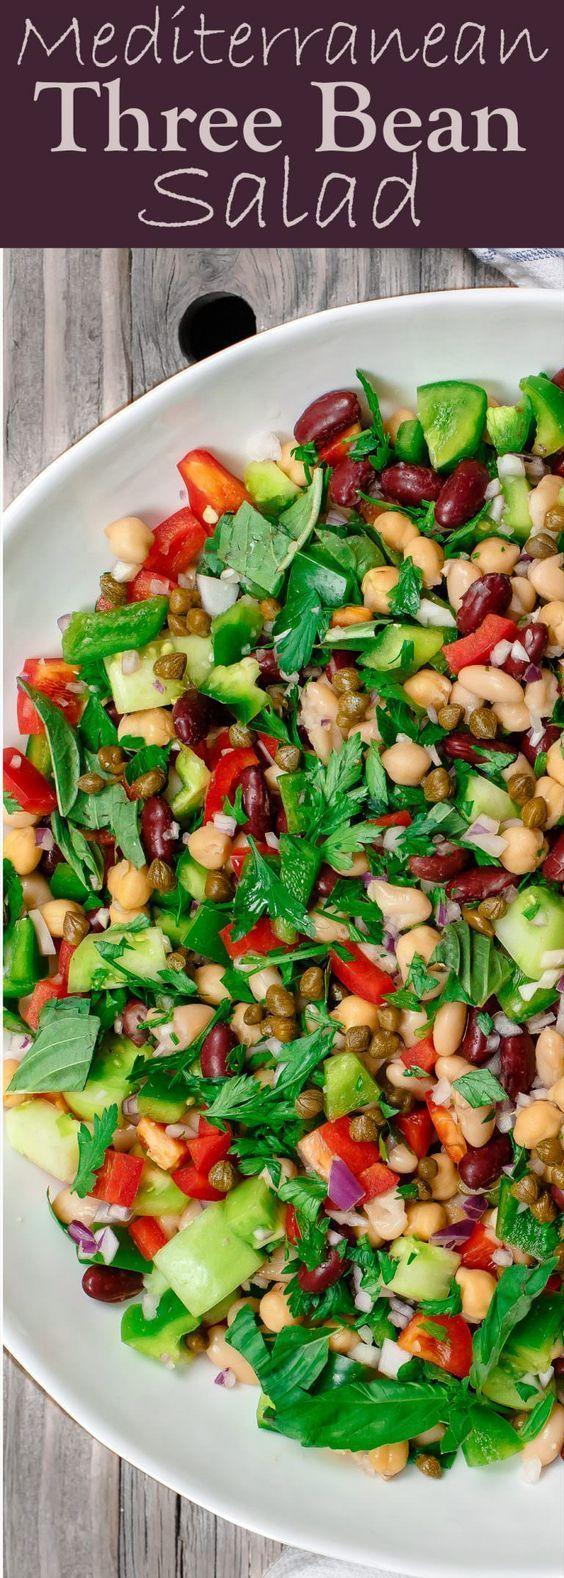 Mediterranean Three Bean Salad The Mediterranean Dish Three Bean Salad With Chopped Veggies Cap Bean Salad Recipes Mediterranean Dishes Healthy Side Dishes